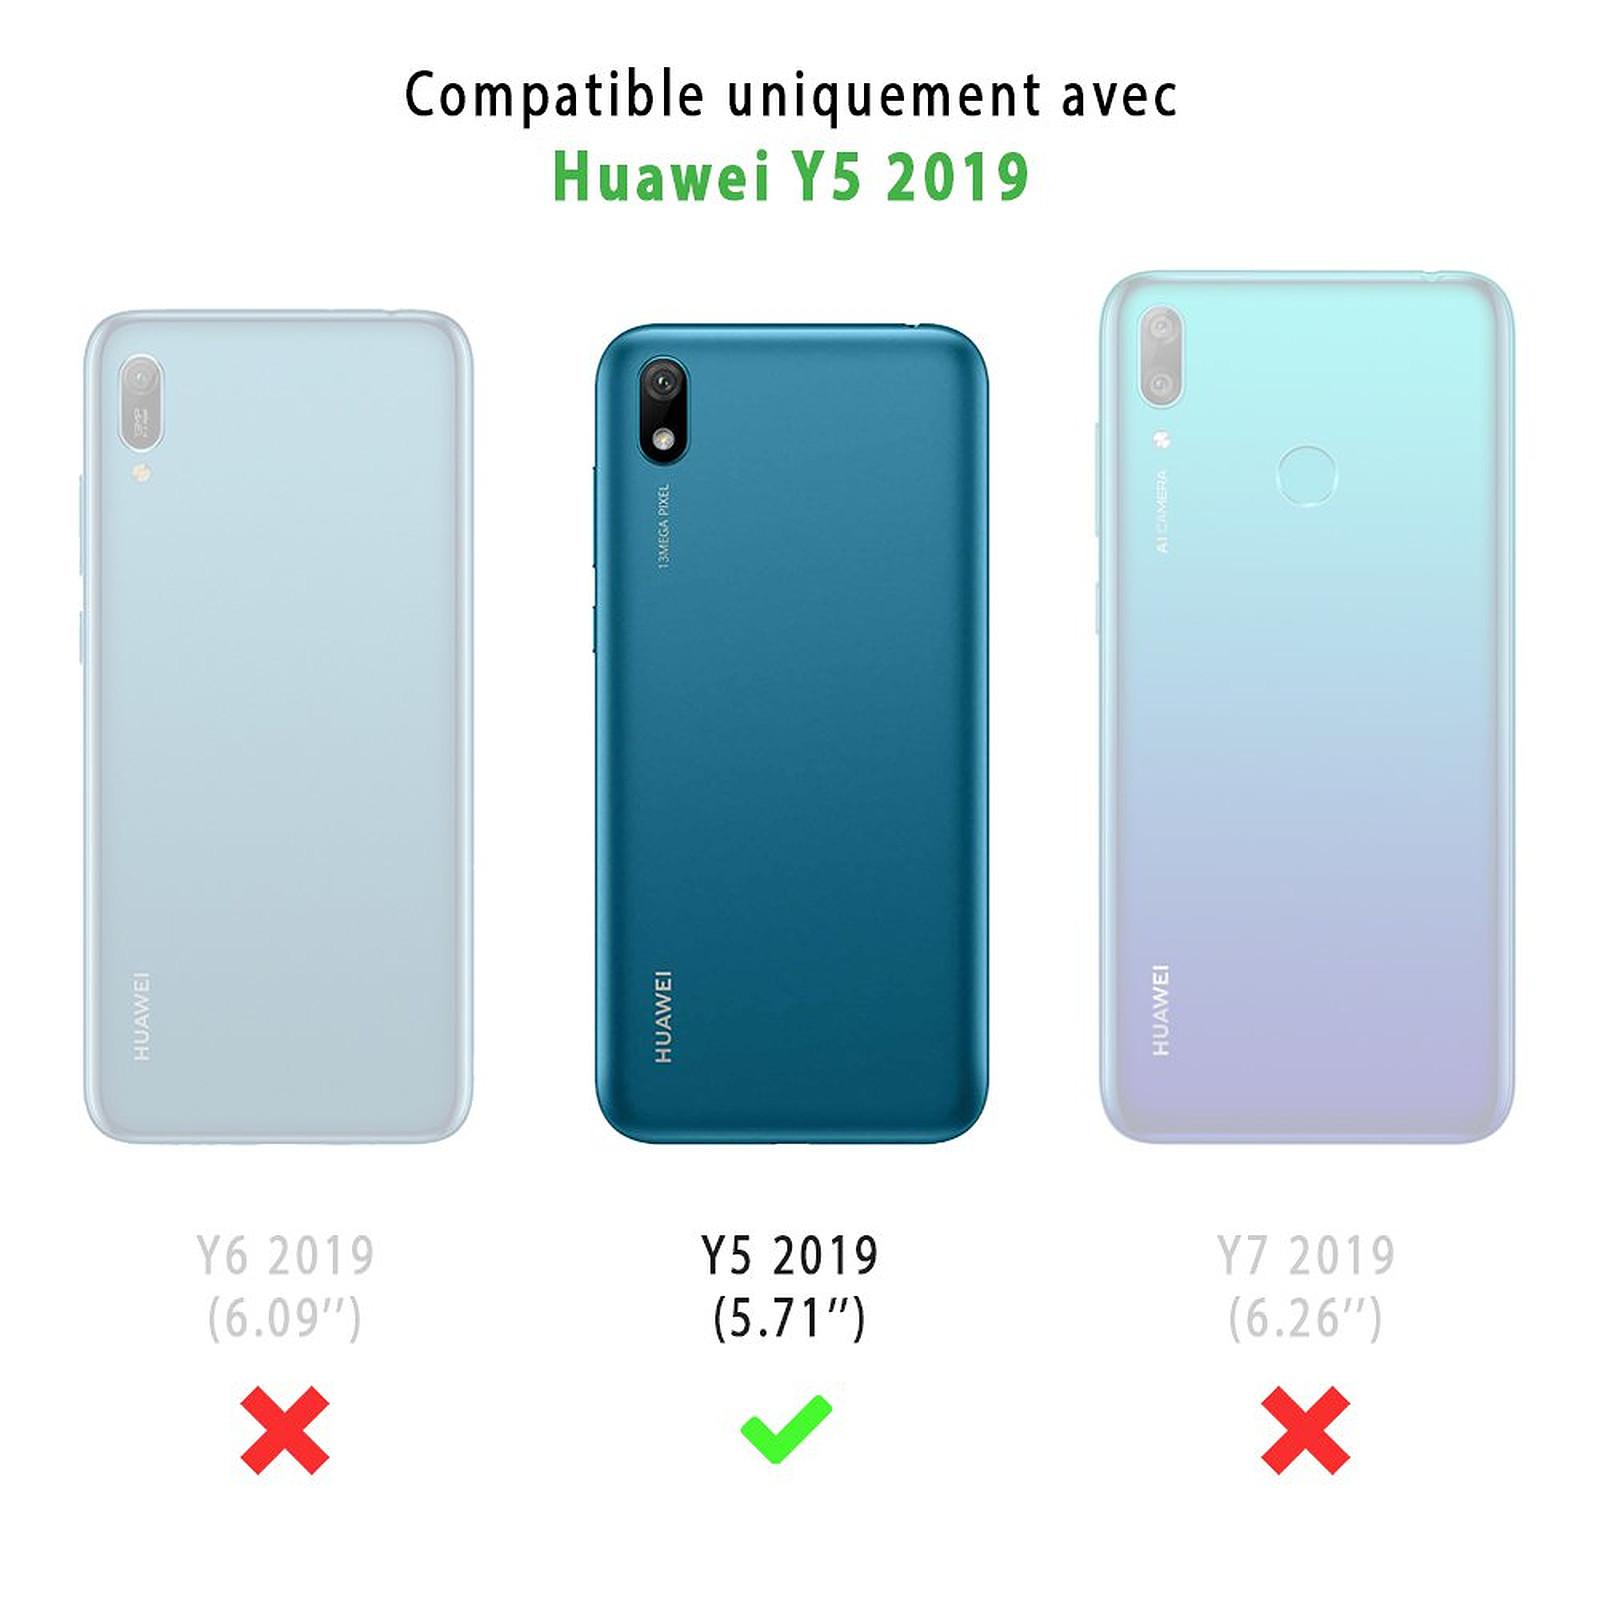 EVETANE Coque Huawei Y5 2019 souple transparente Brille comme une licorne